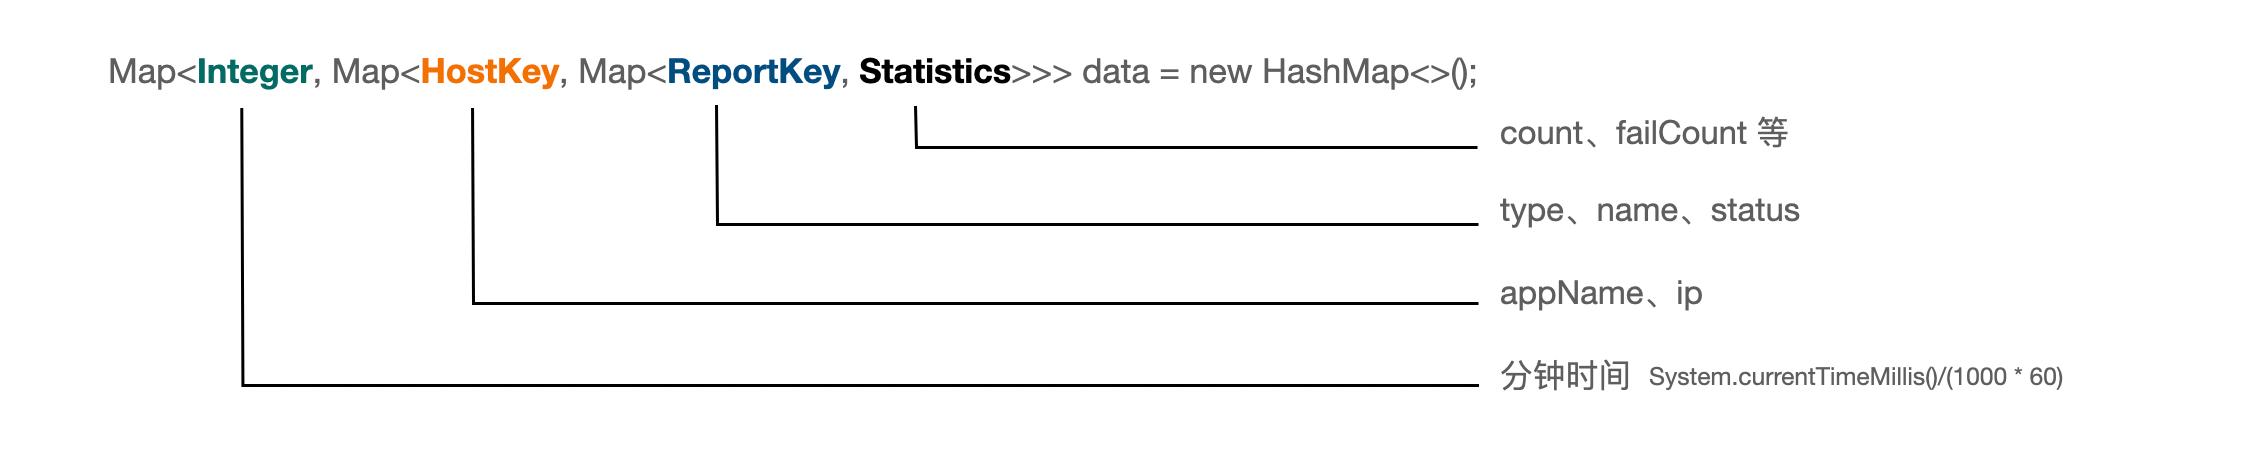 transaction-statistics